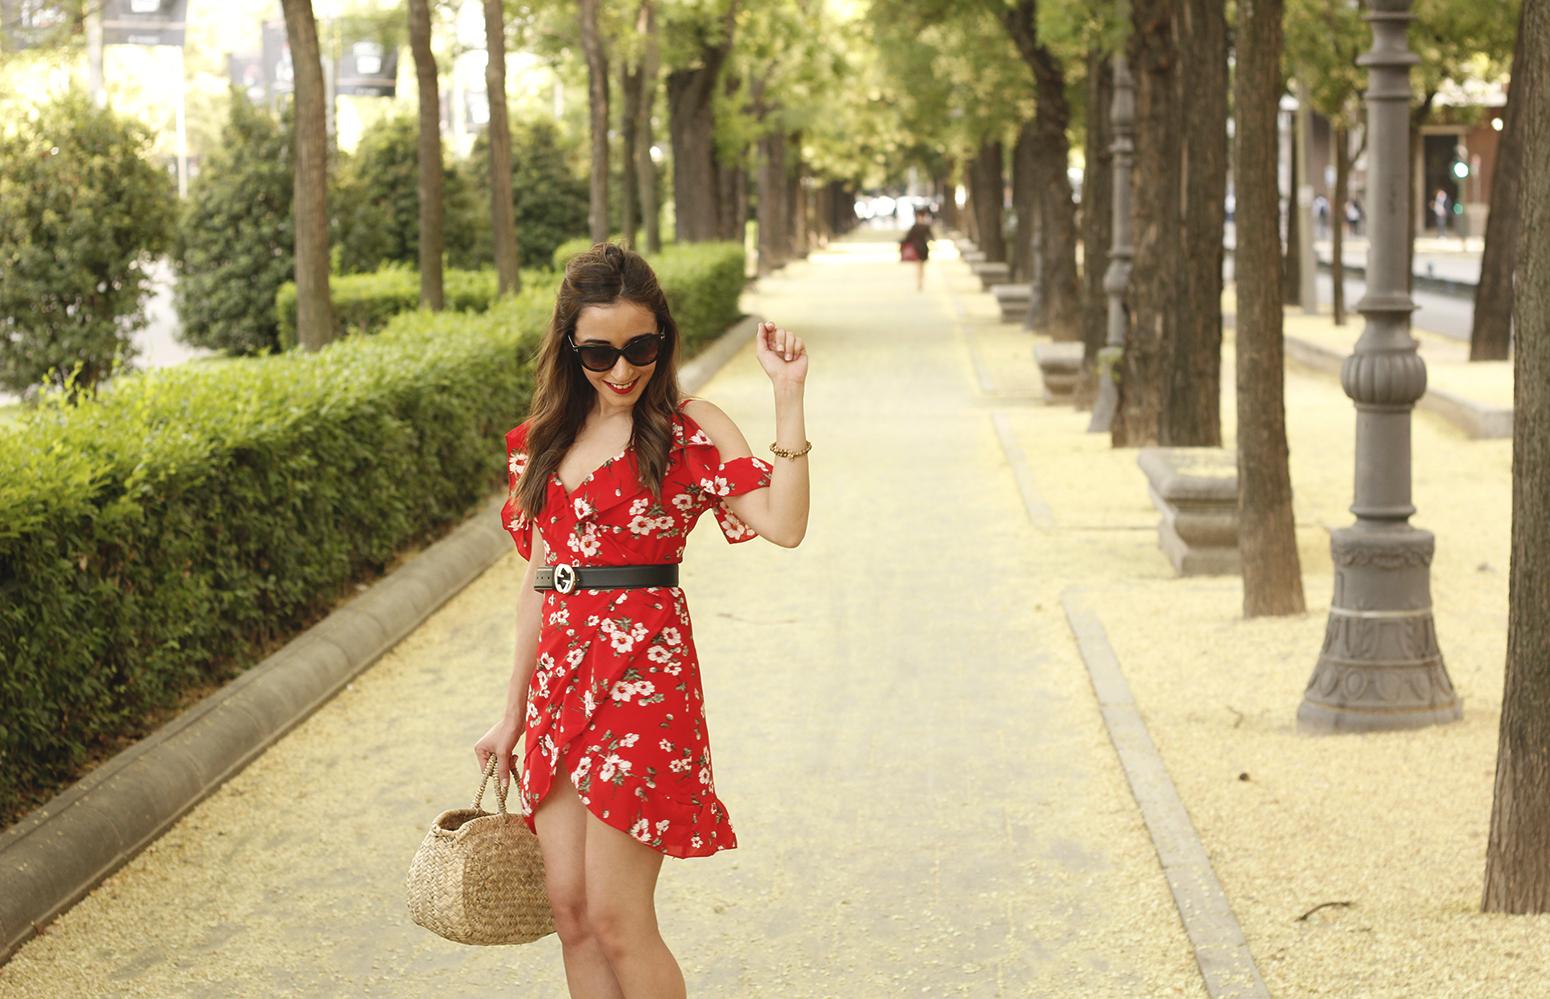 Red flower dress nude heels gucci belt rafia bag style fashion summer14